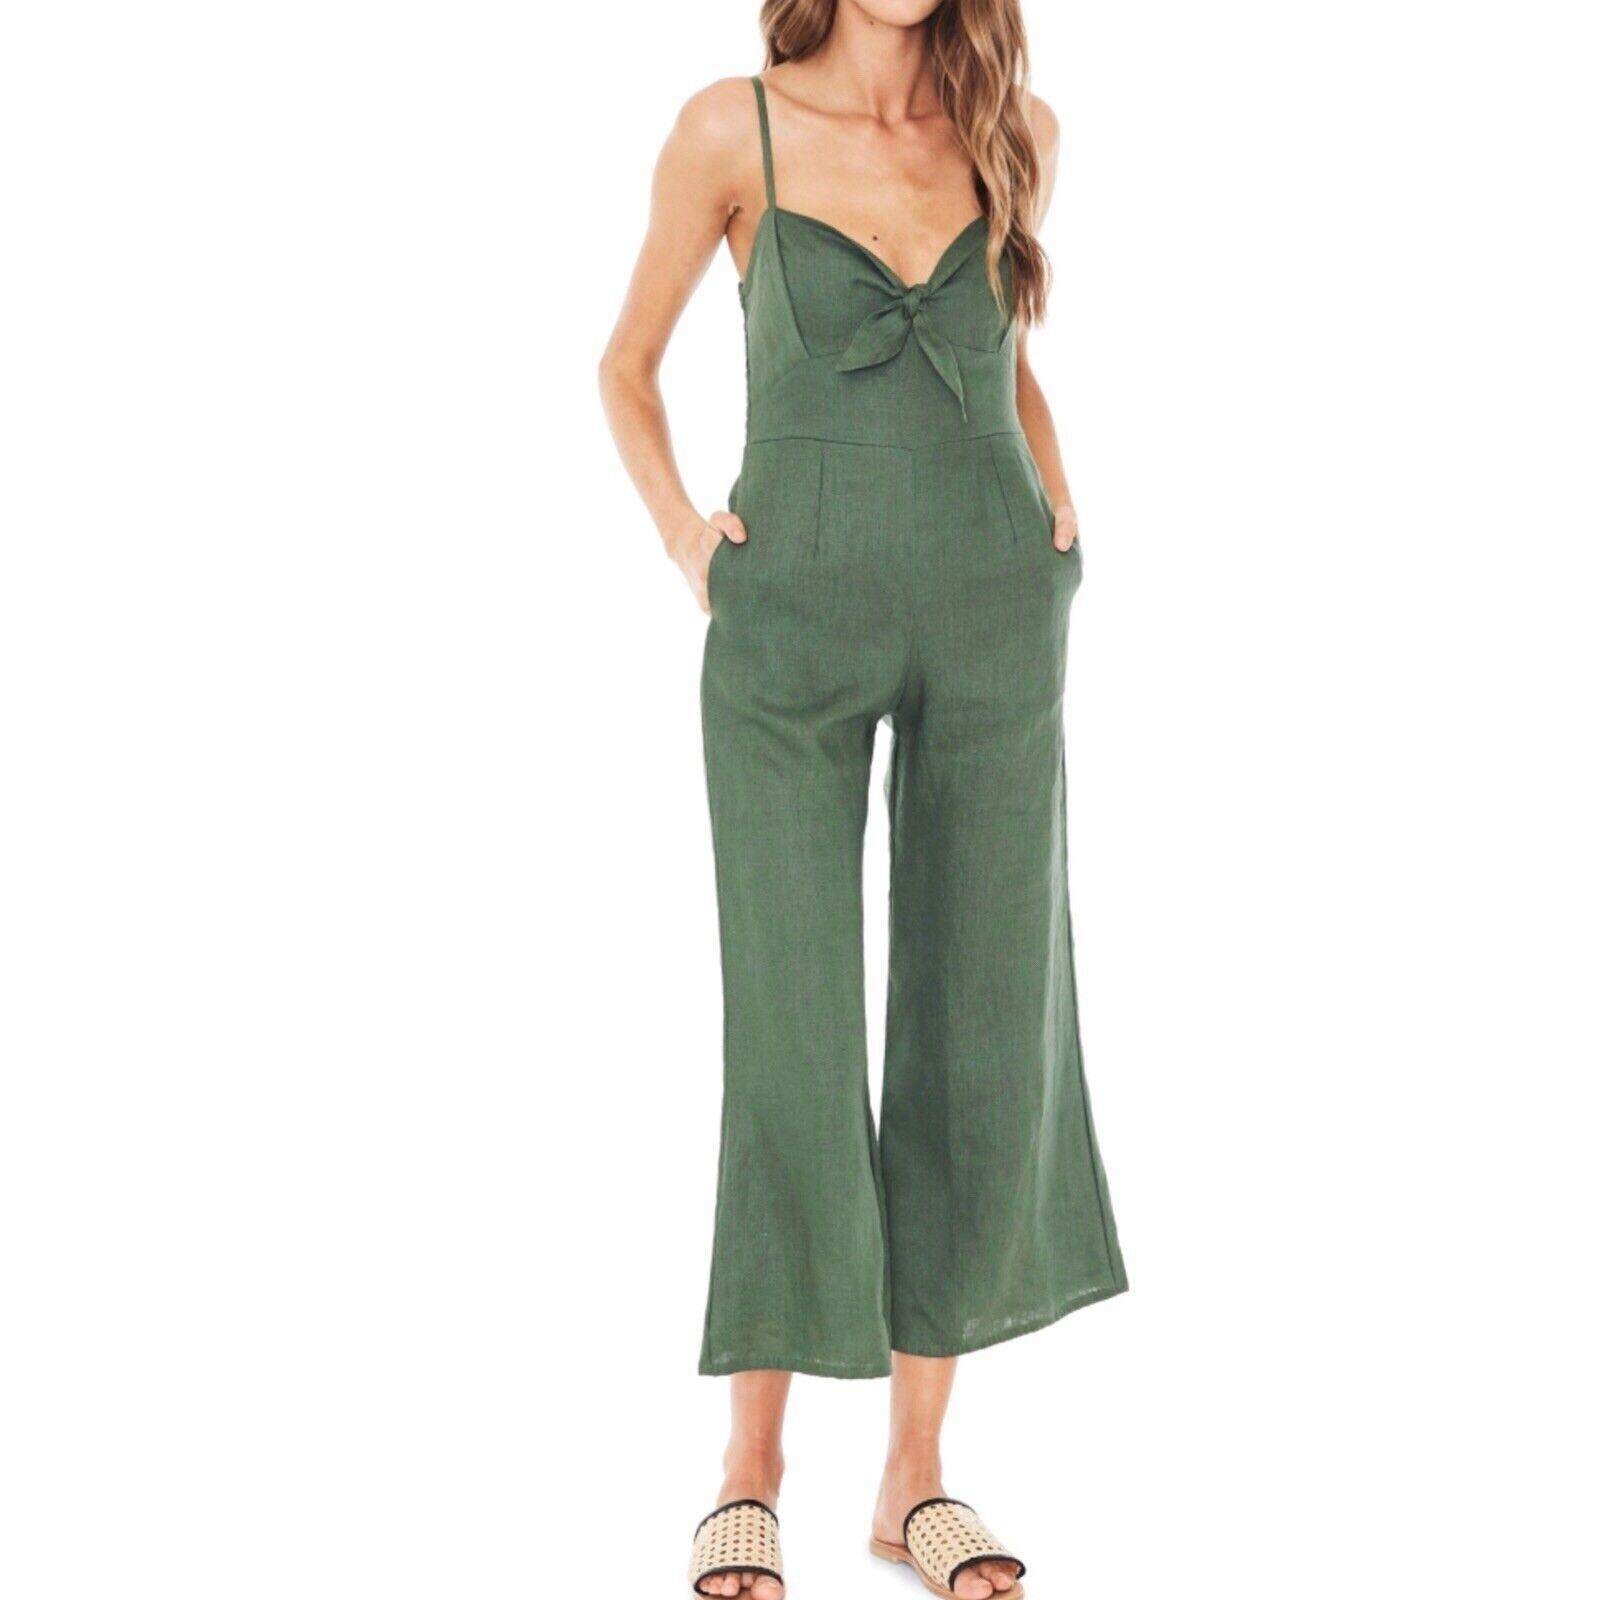 Anthropologie Faithful The Brand Presley Wide-Leg Jumpsuit Woman Sz XL New  209